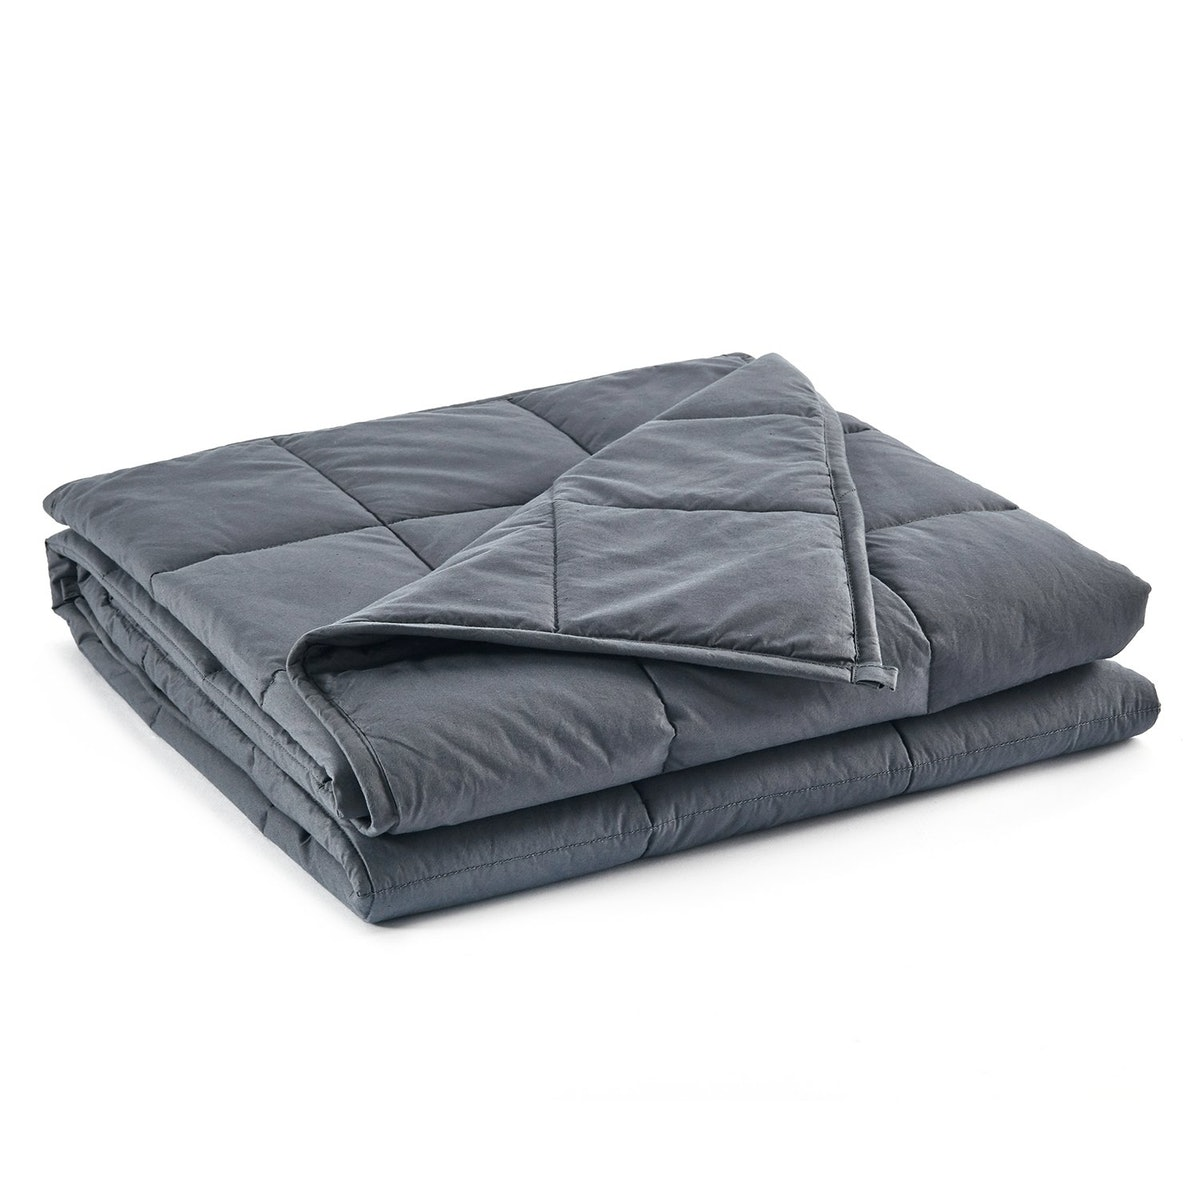 RelaxBlanket Premium Cotton Weighted Blanket